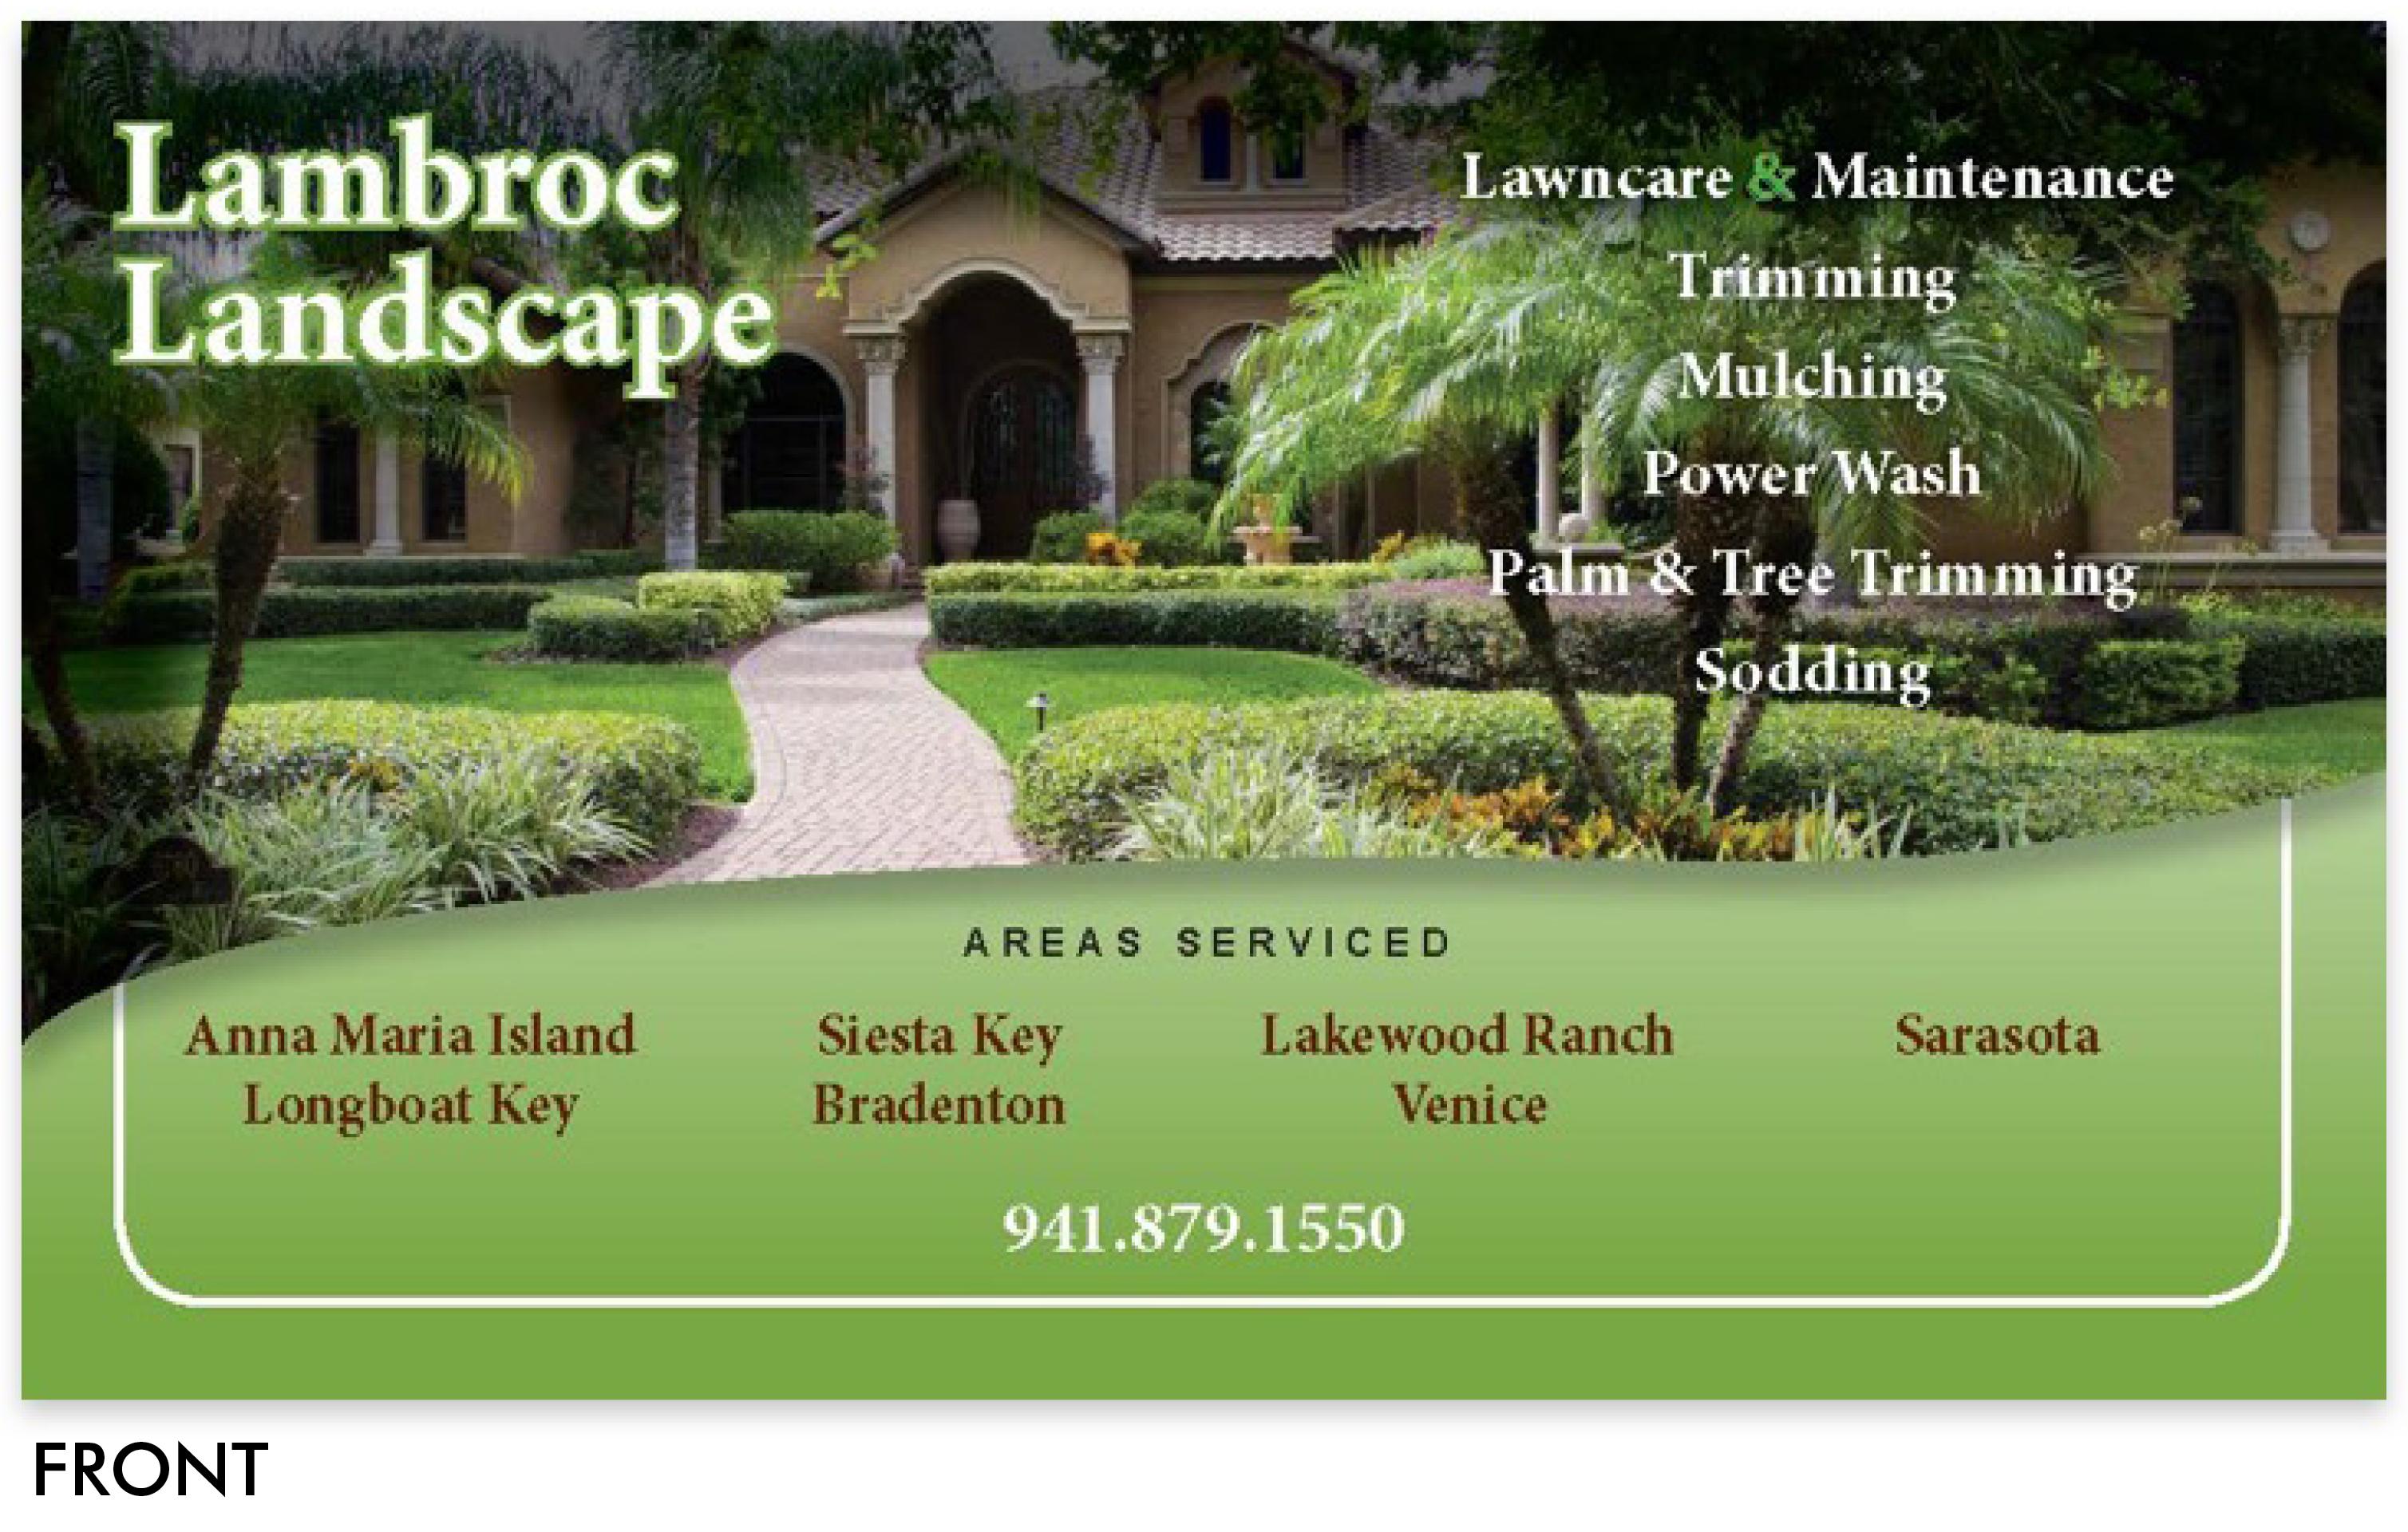 Lambroc Landscaping Business Card